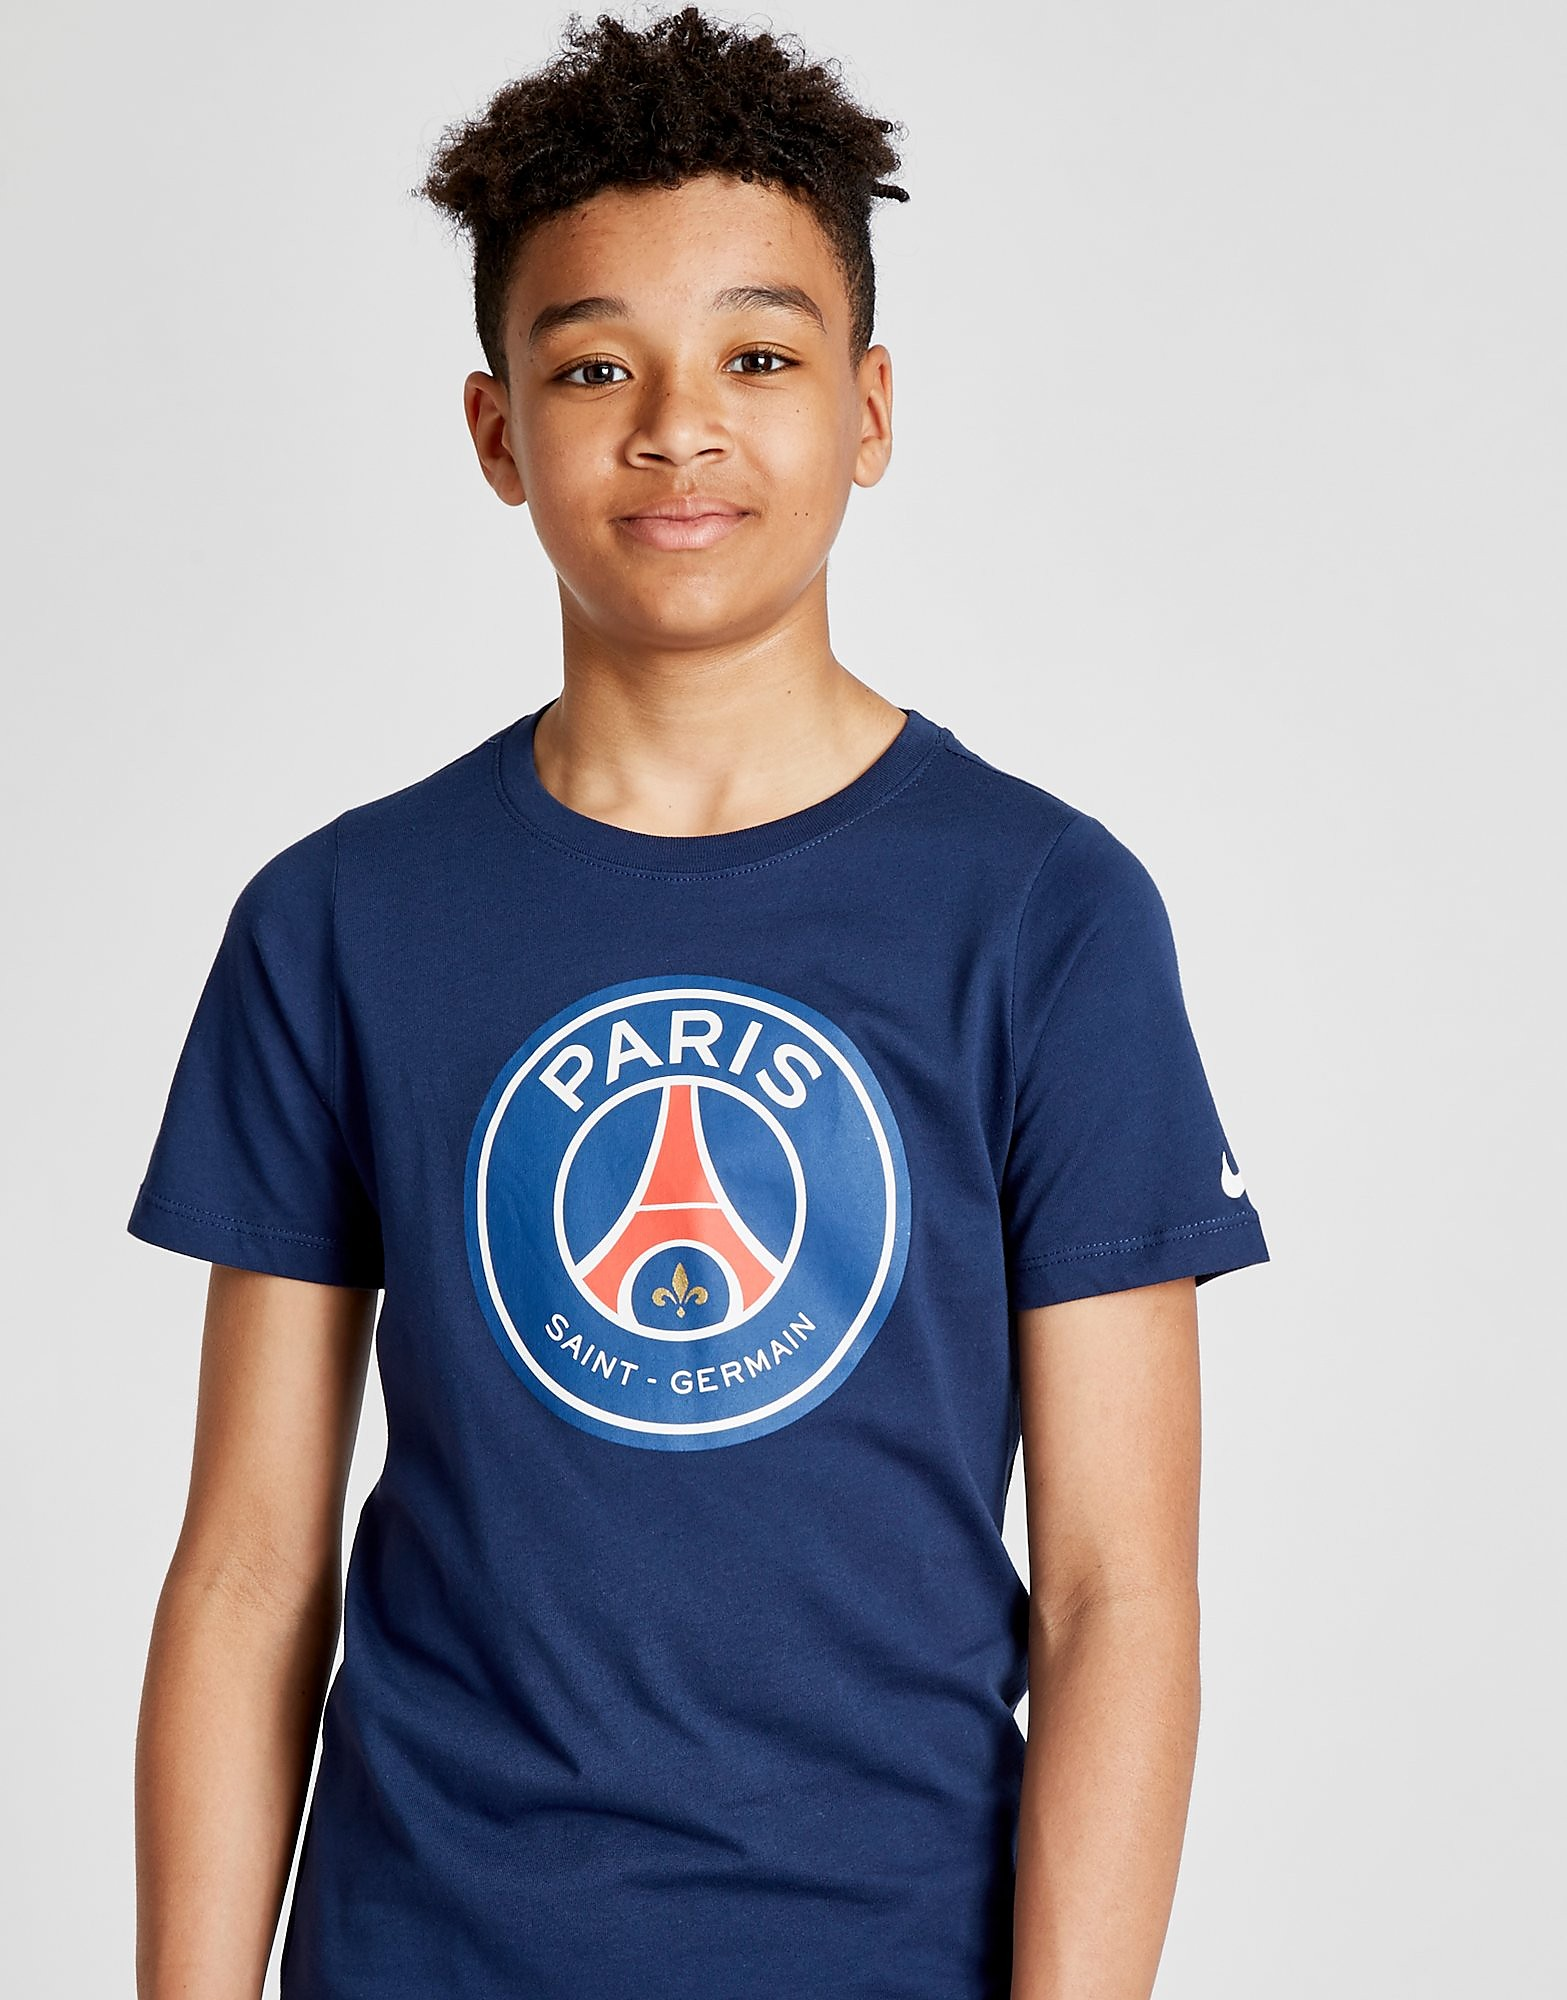 Nike Paris Saint Germain 2018/19 Crest T-shirt Junior